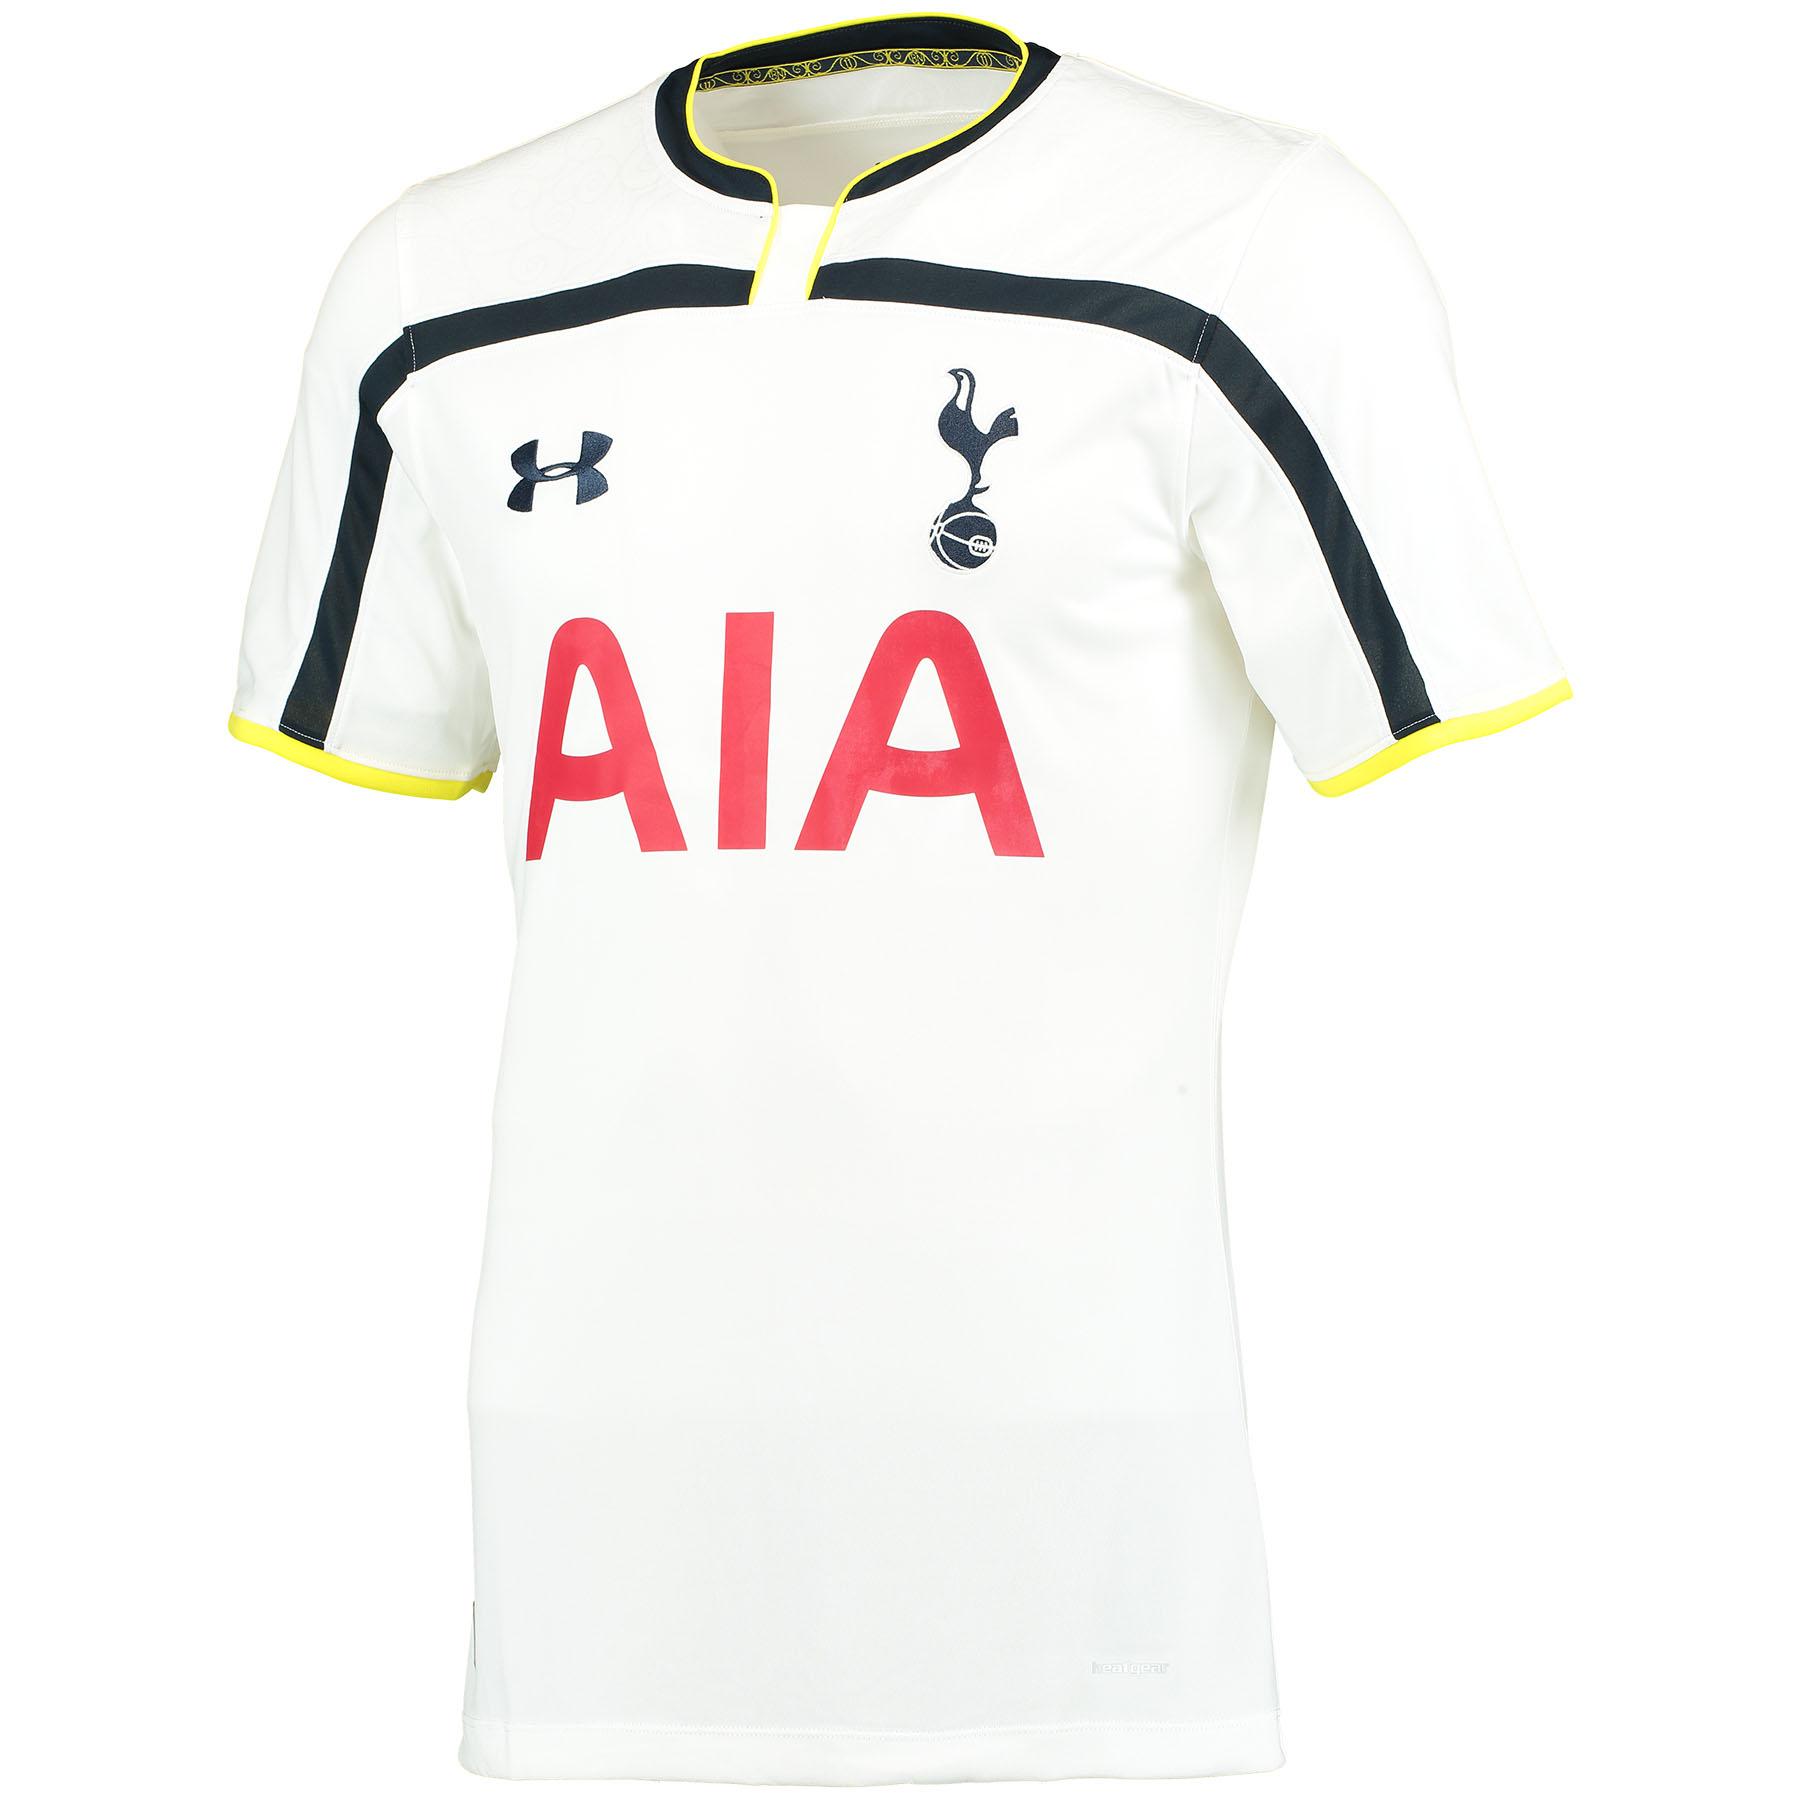 Tottenham Hotspur Home Shirt 2014/15